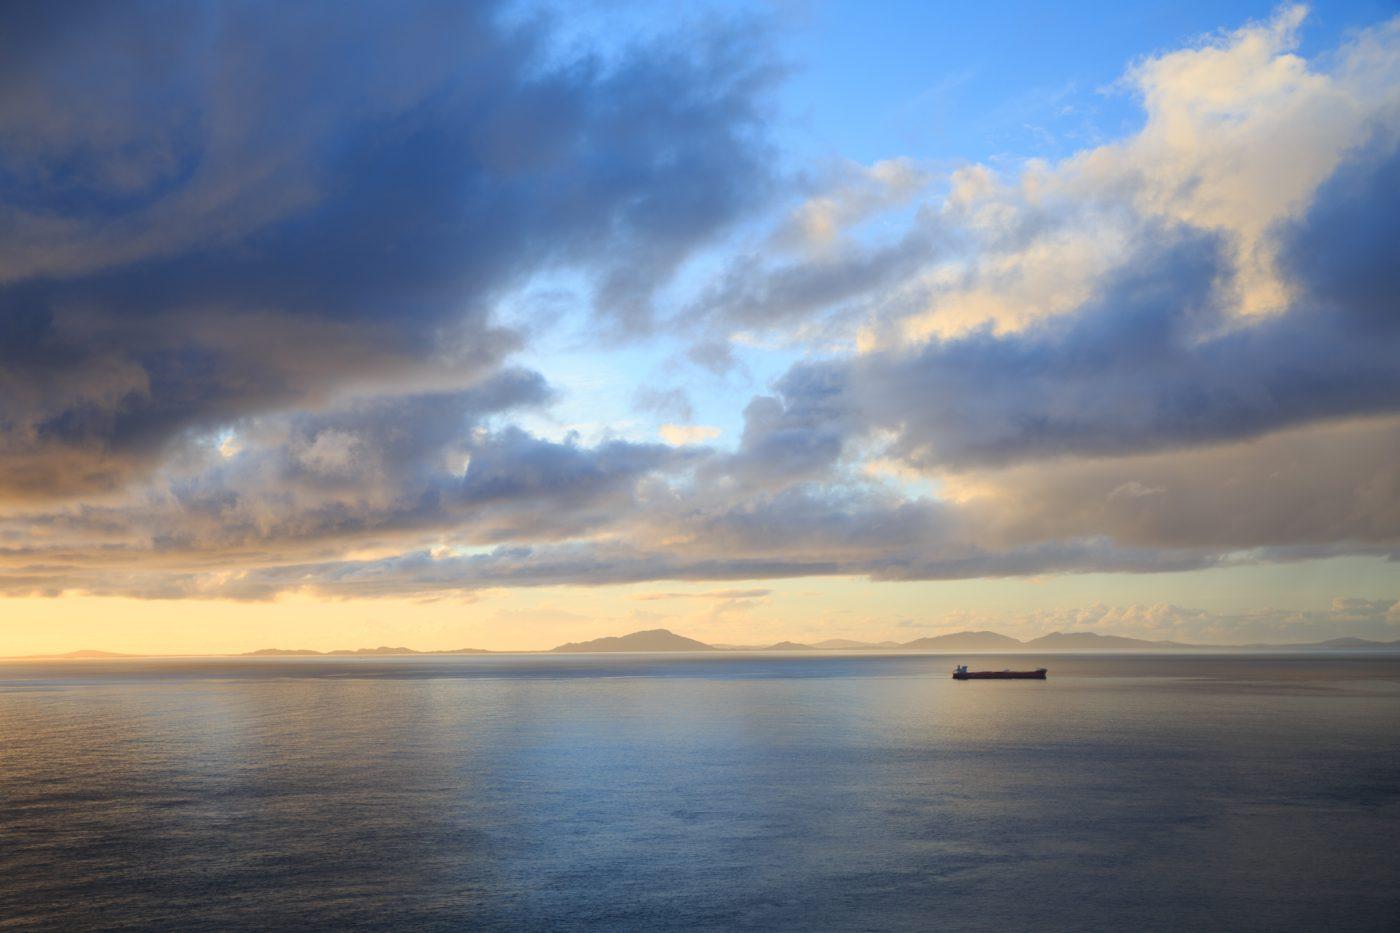 Isle of Skye, Schottland, Sonnenuntergang am Meer